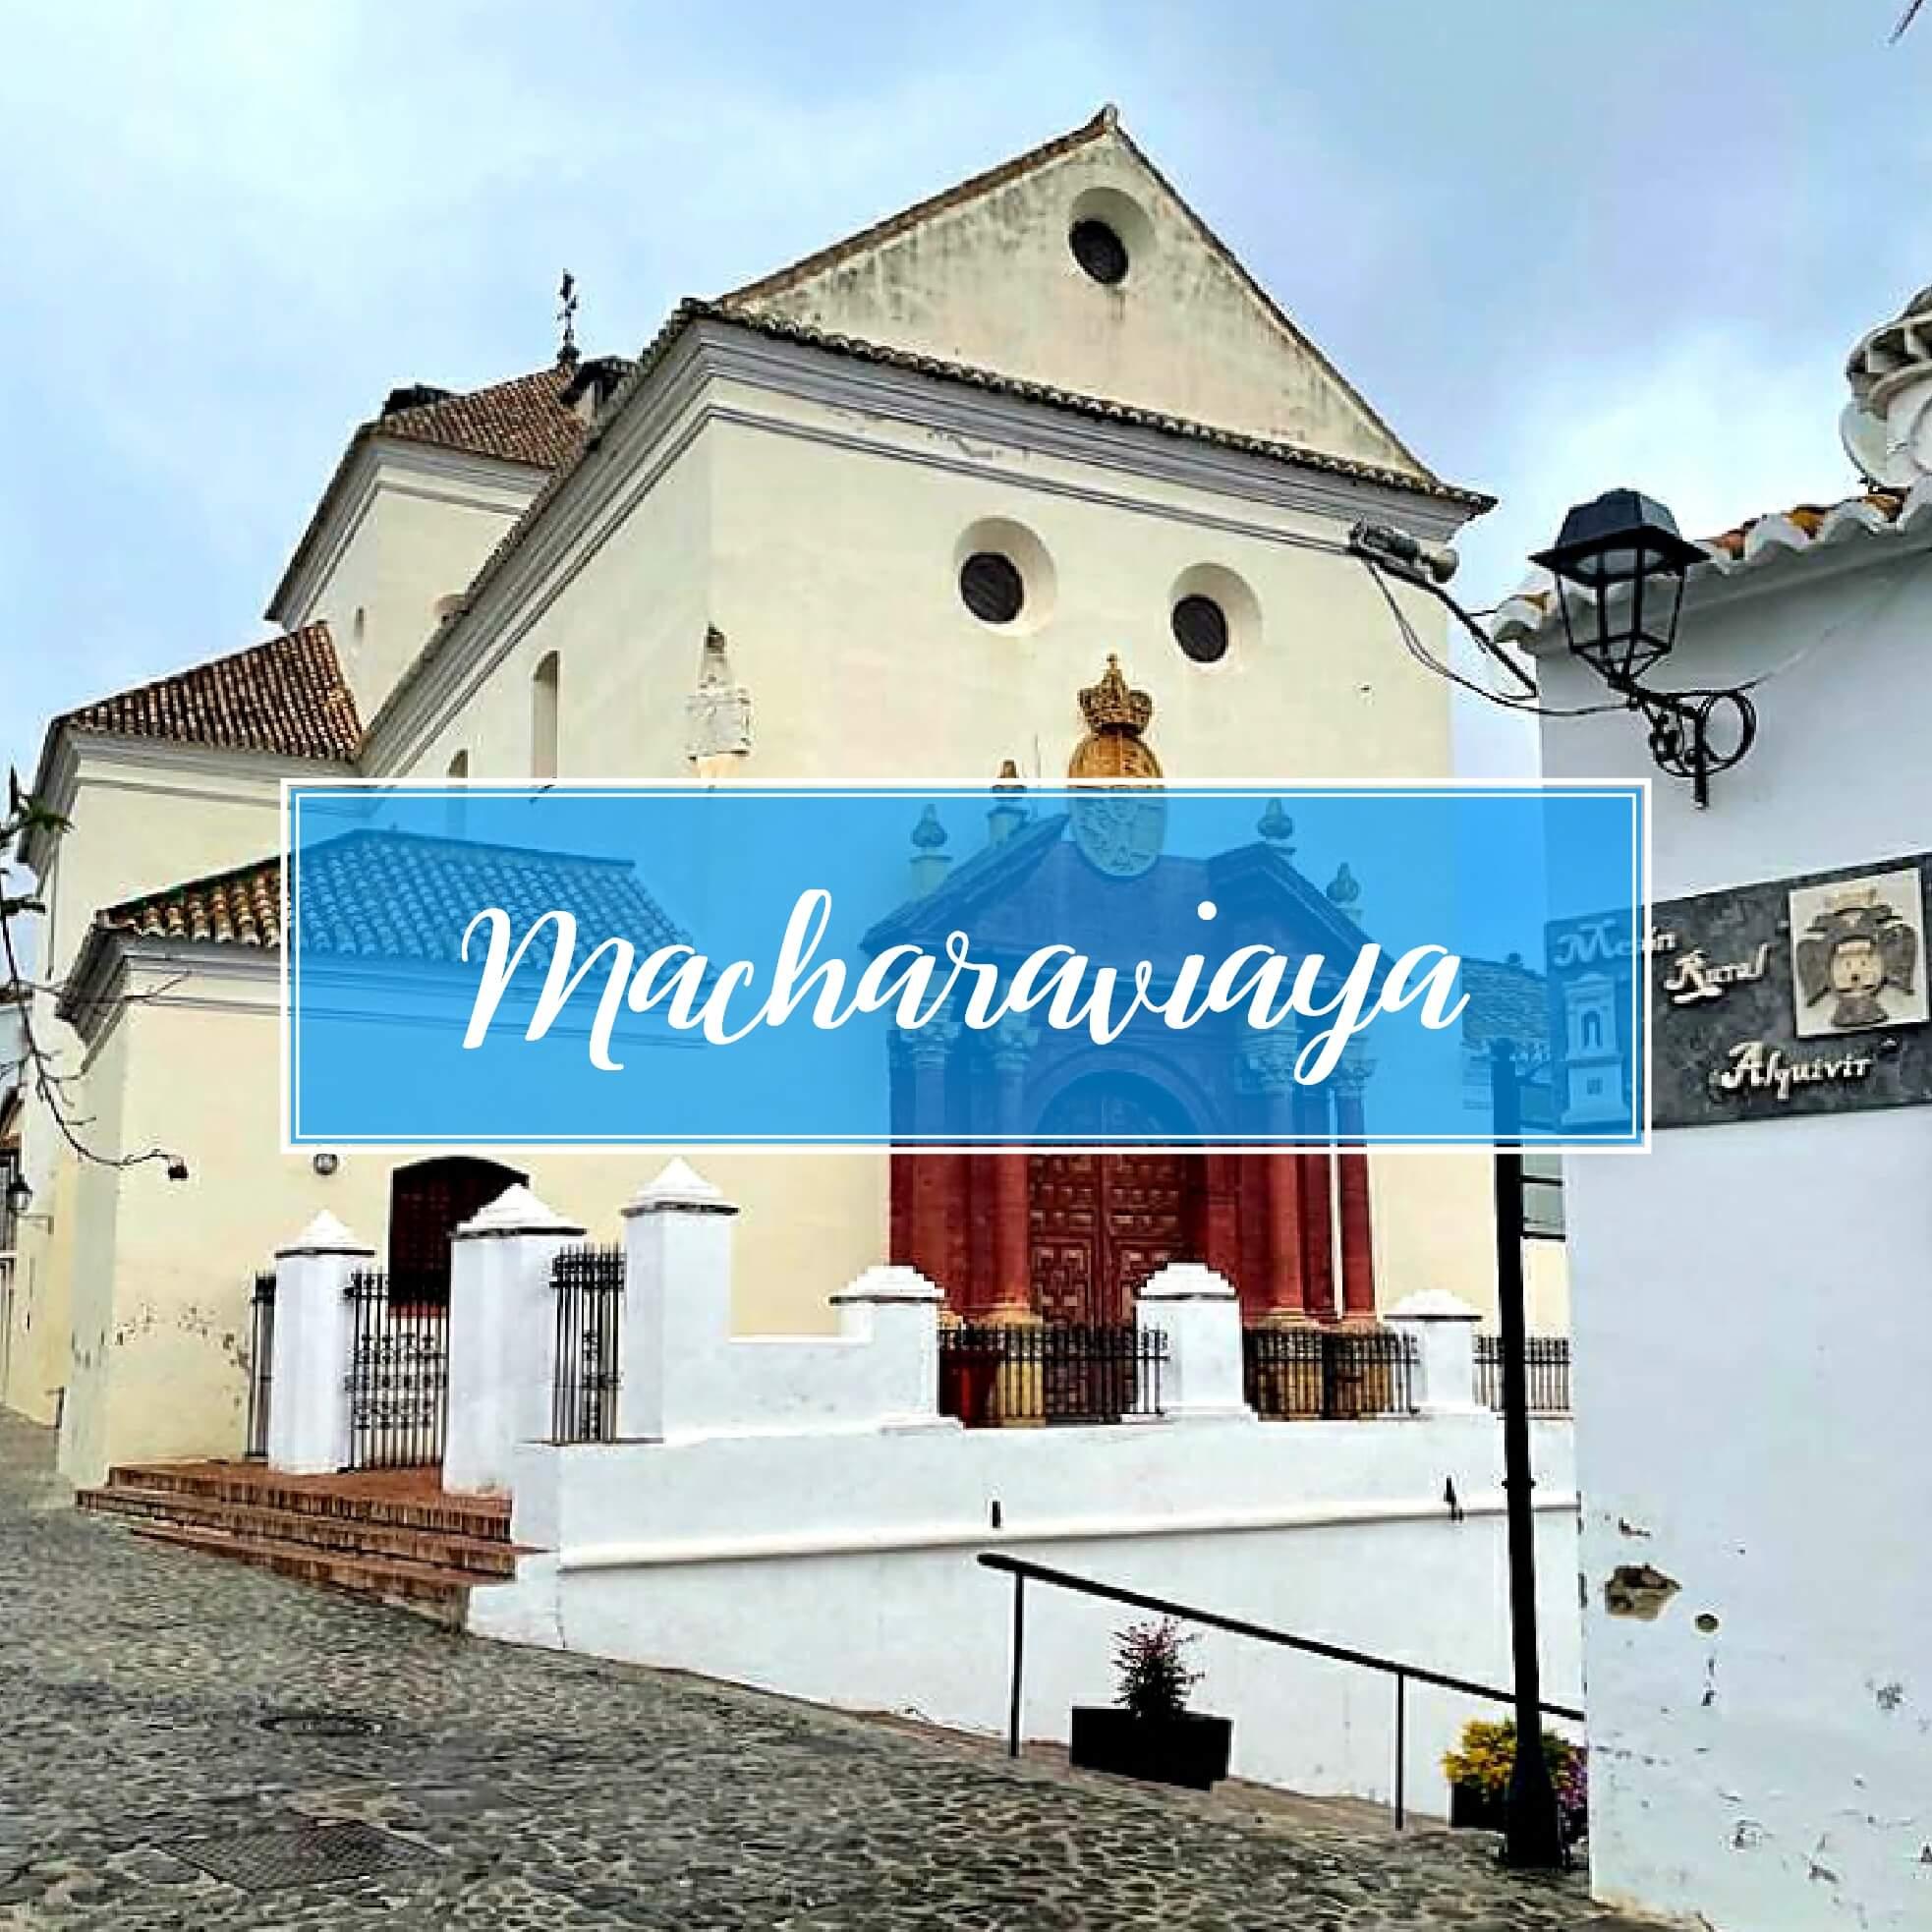 Macharaviaya Pueblo Malaga